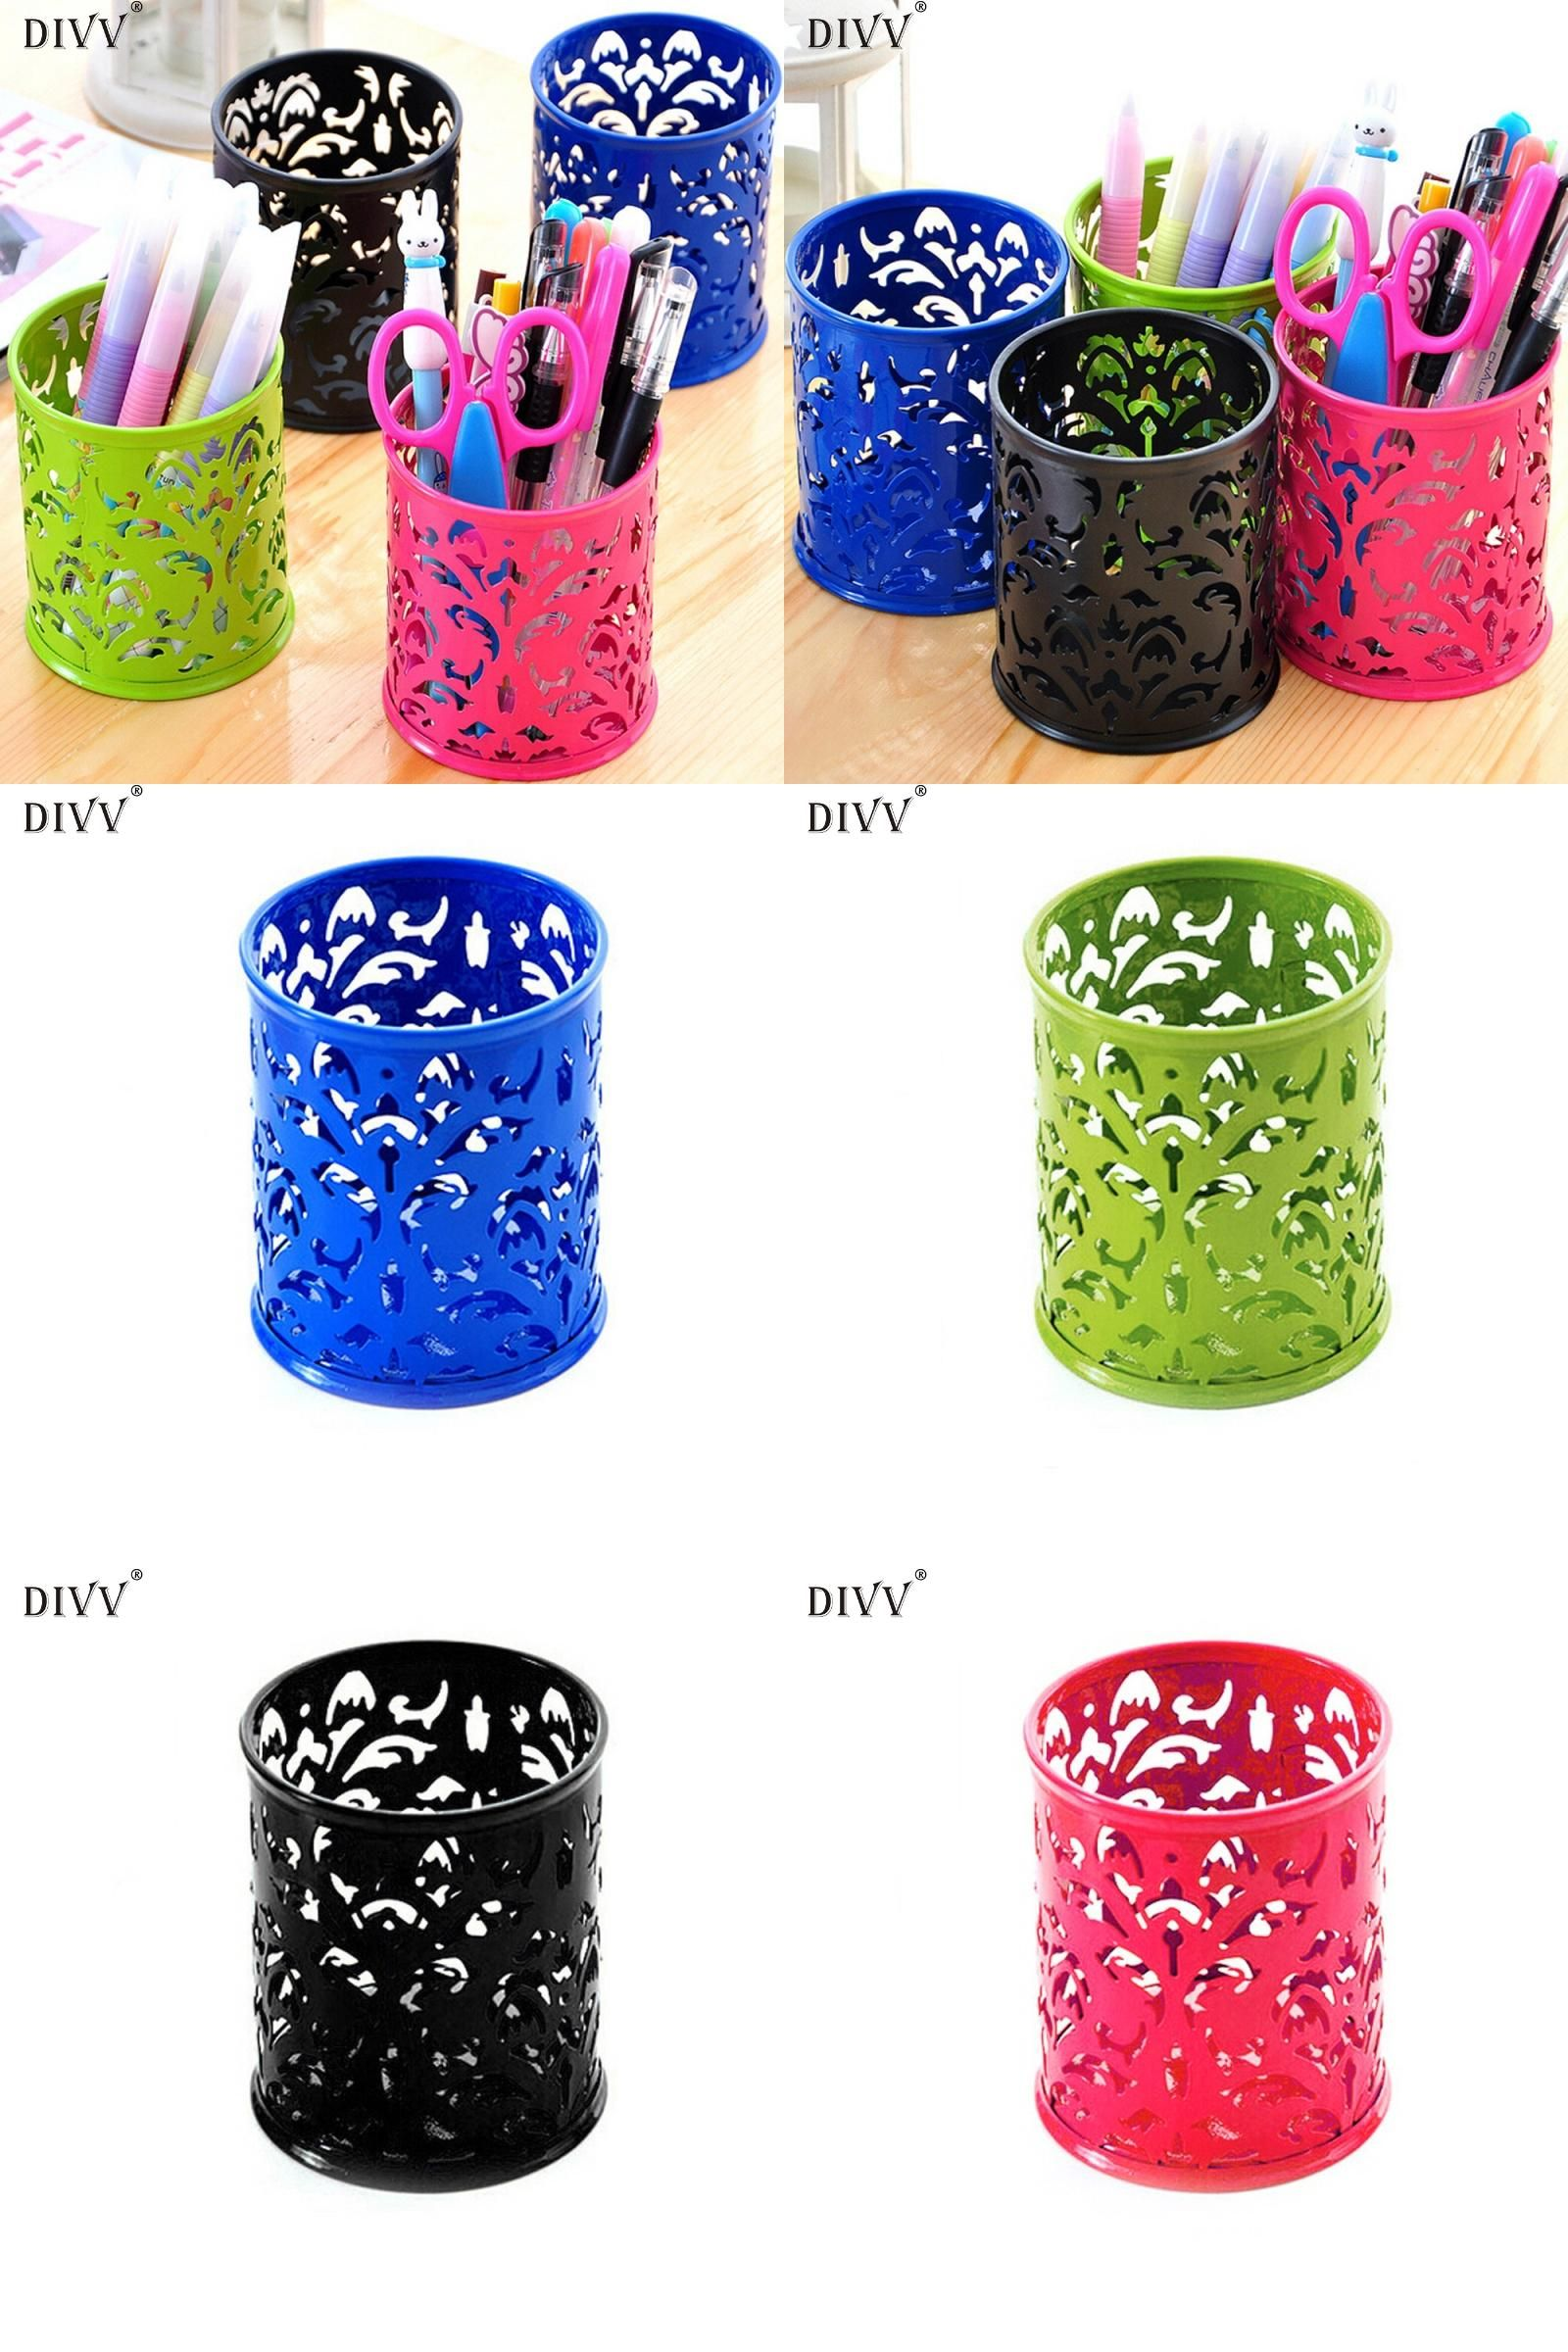 [Visit to Buy] DIVV Pen Holder Makeup Brush Vase Pattern Brush Pot Pen Holder Stationery Storage 1PC #Advertisement